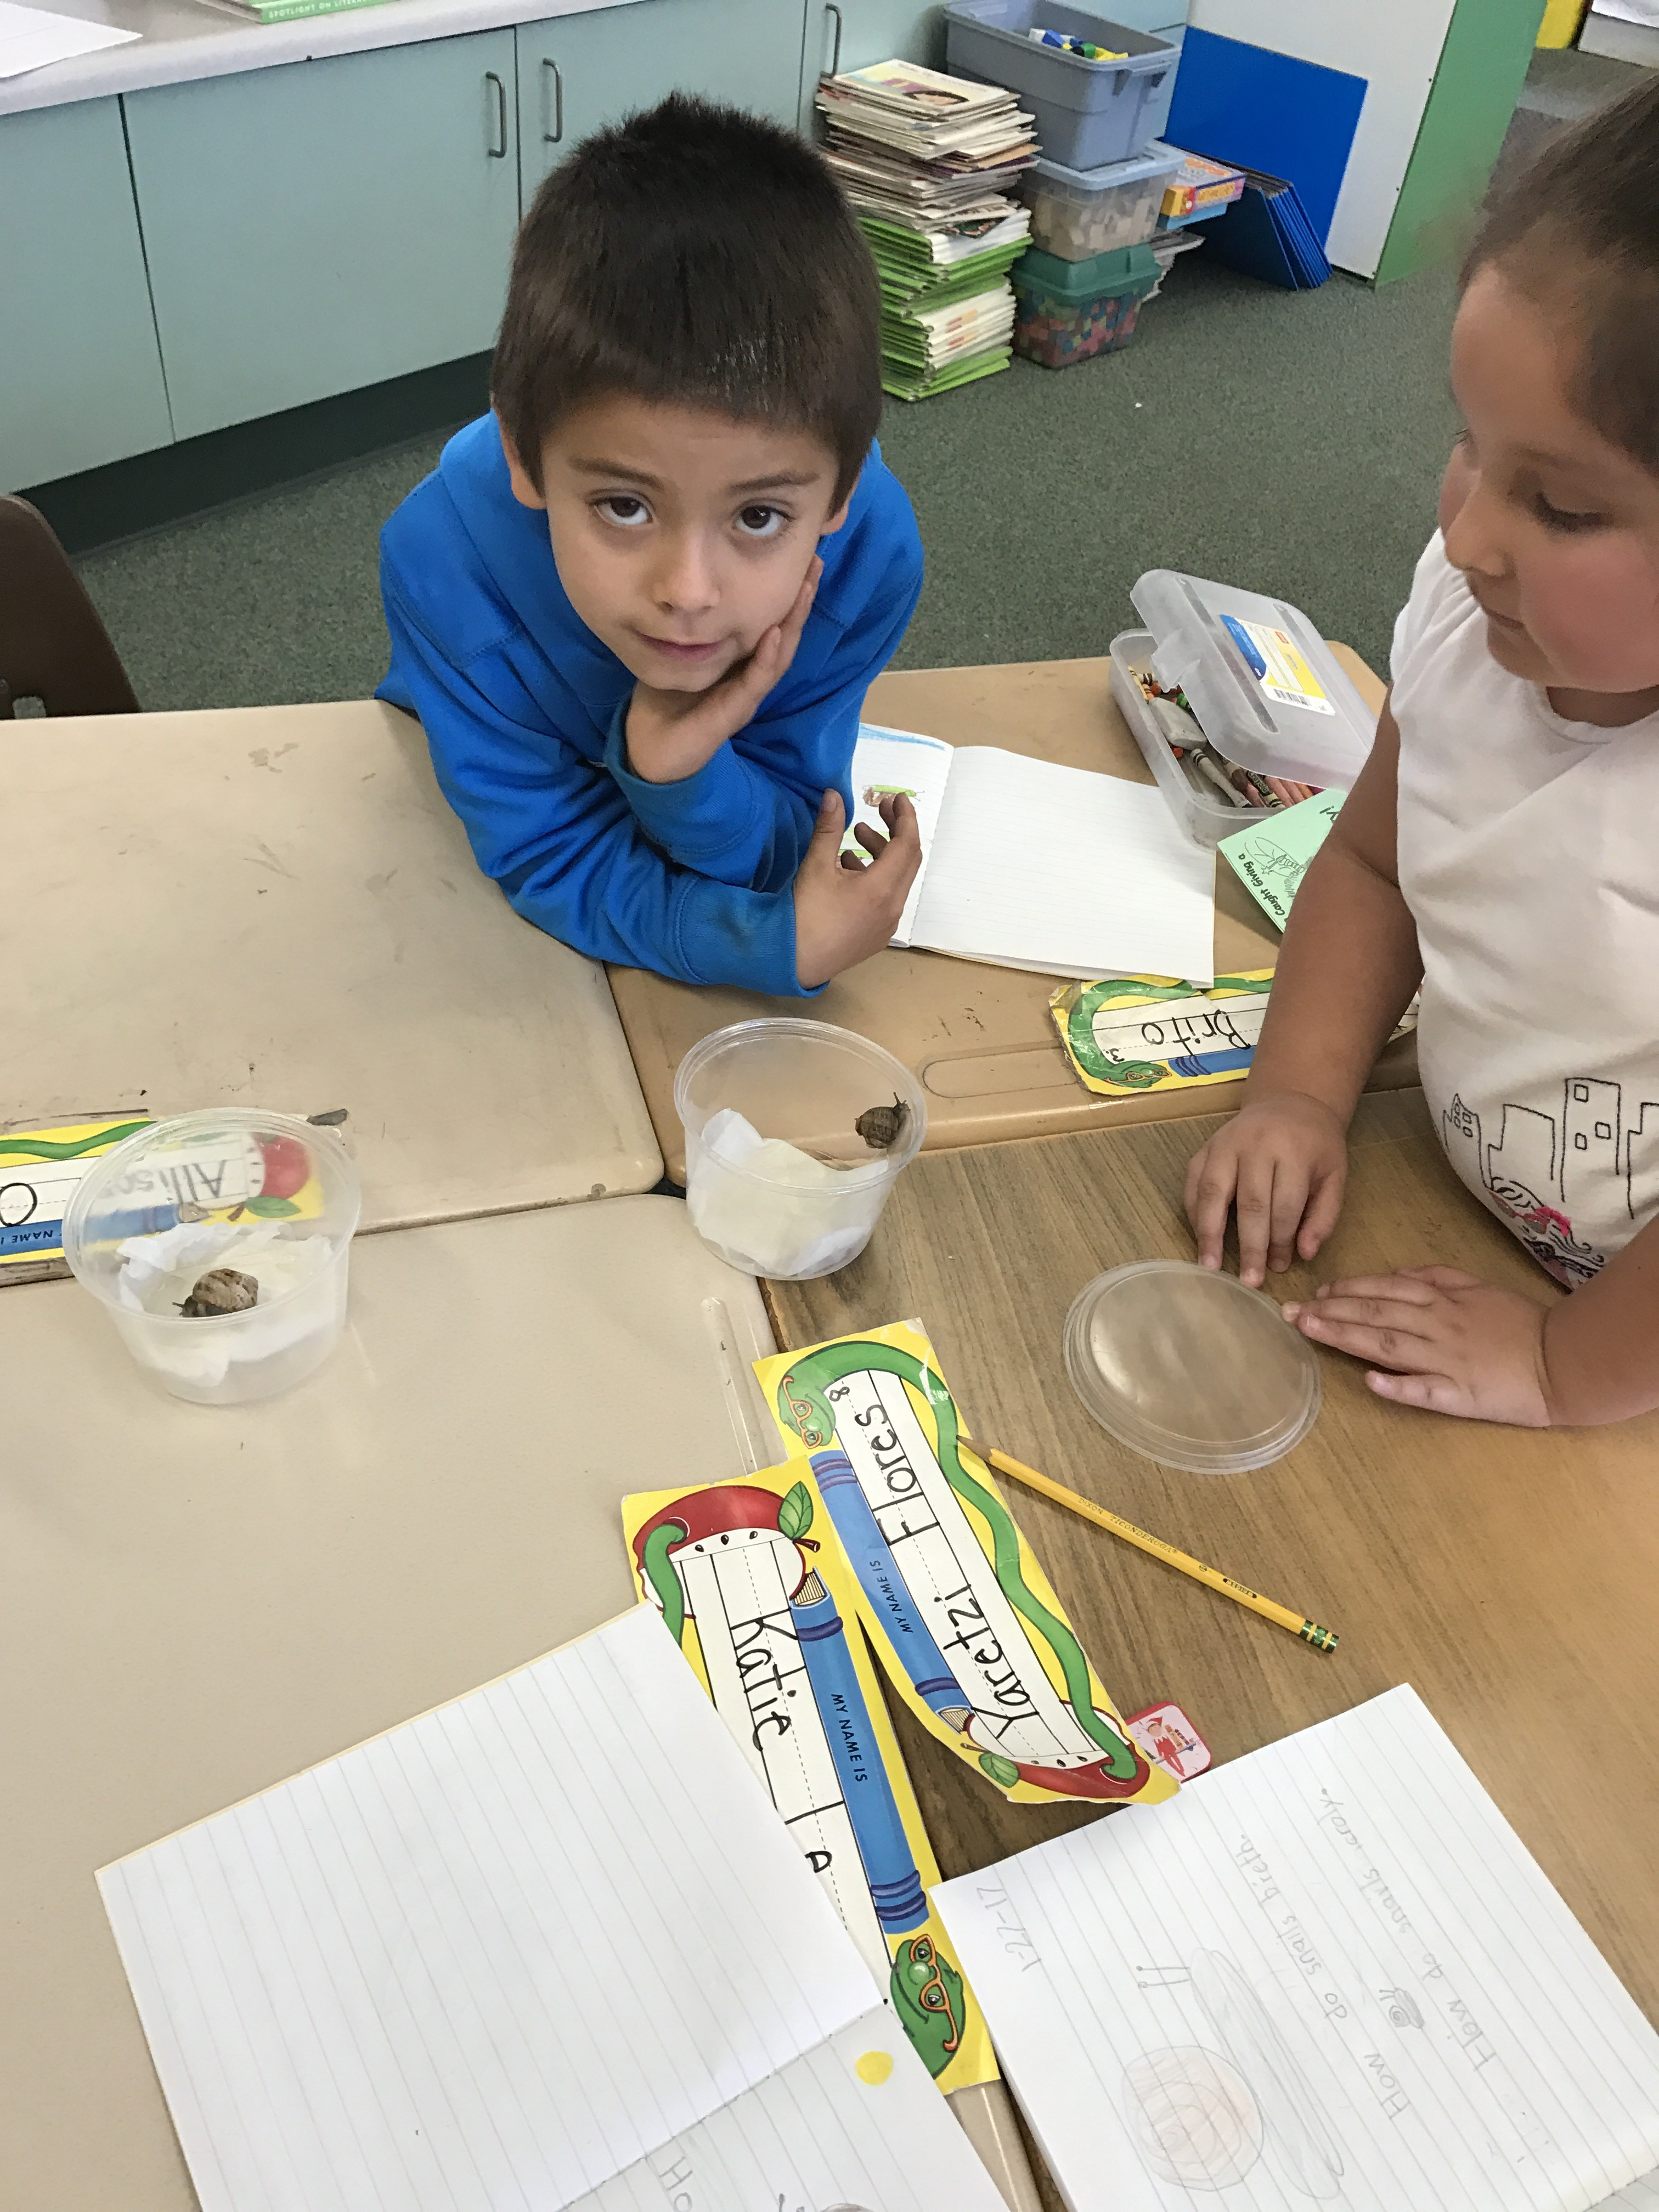 Investigating snails